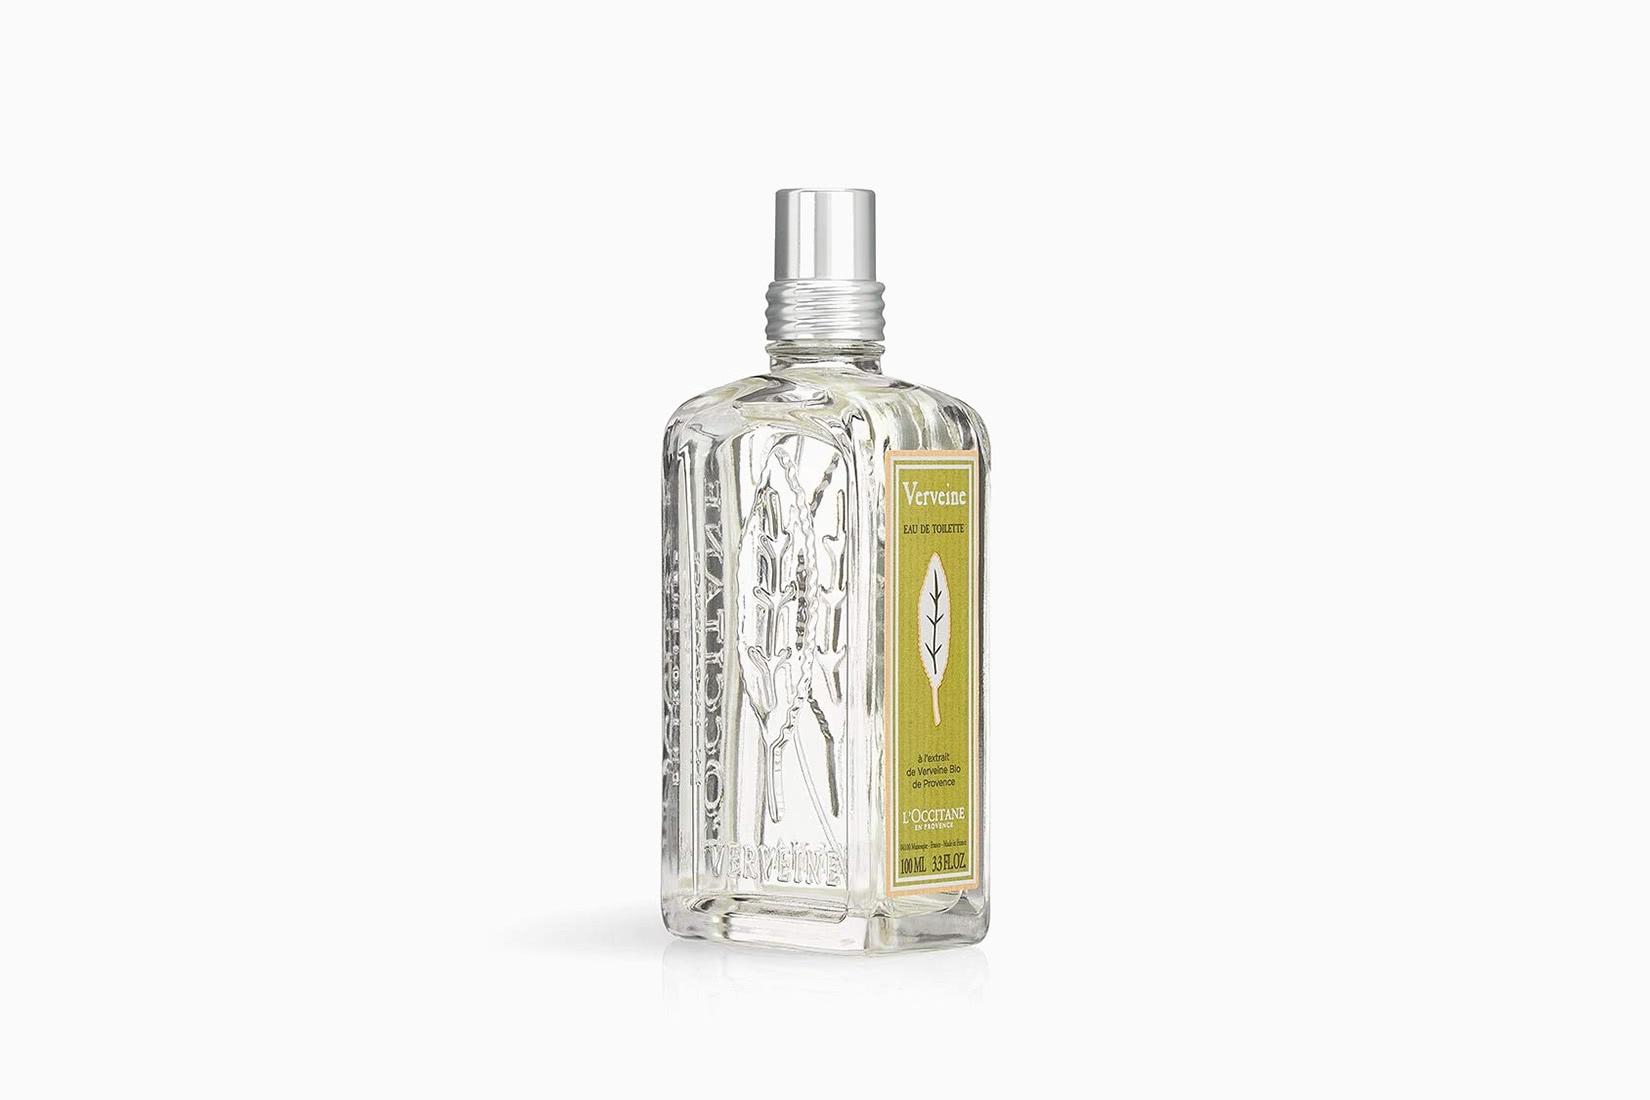 best women perfume L'Occitane Refreshing Verbena - Luxe Digital